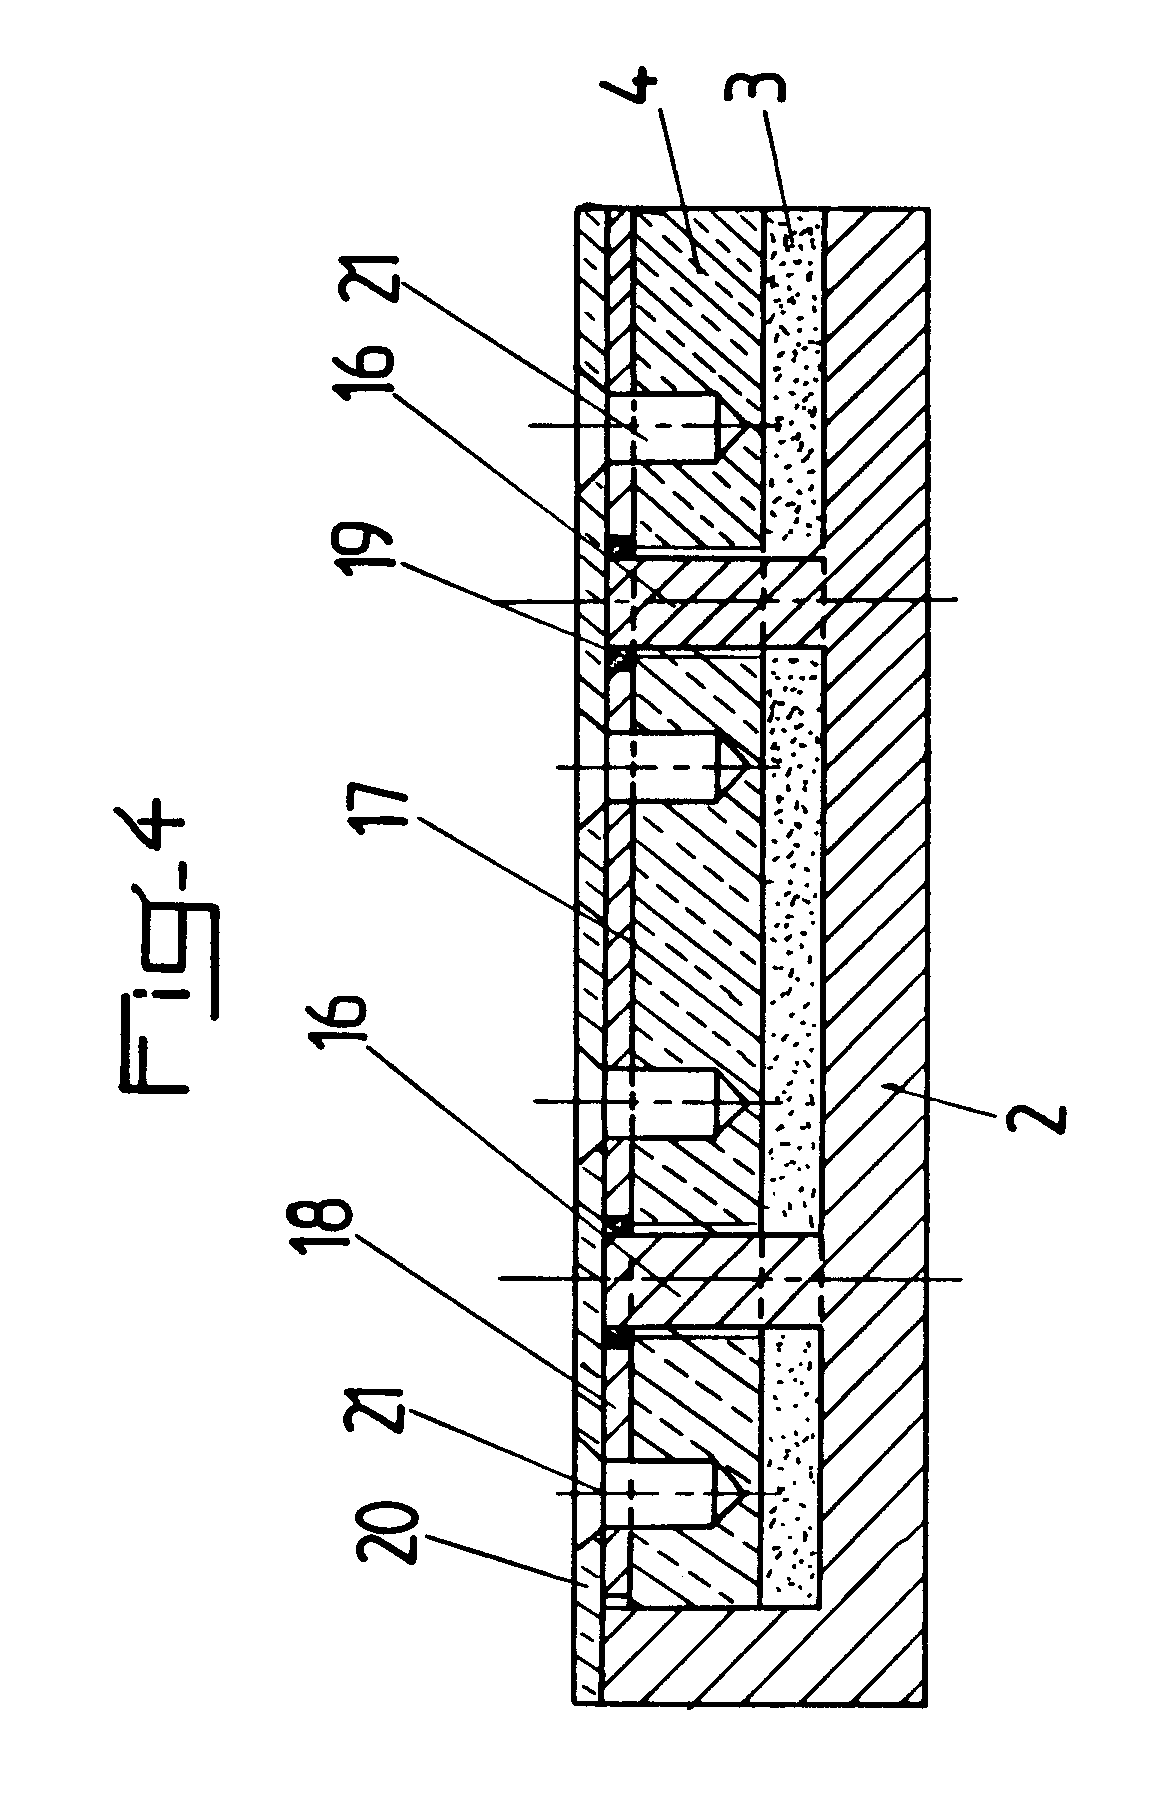 patent ep0558432a1 paroi blind e composite google patents. Black Bedroom Furniture Sets. Home Design Ideas